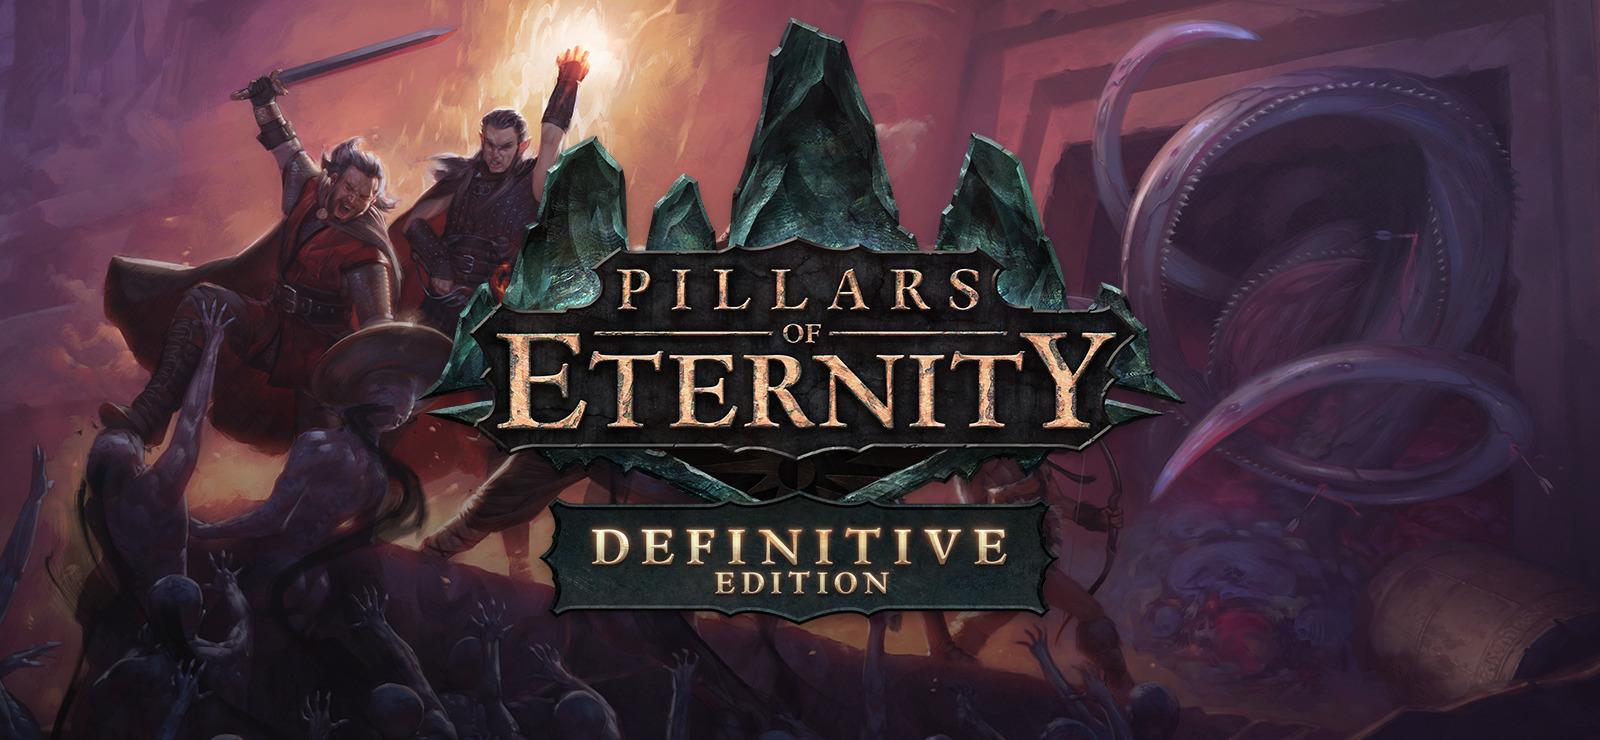 Pillars of Eternity: Definitive Edition on GOG.com